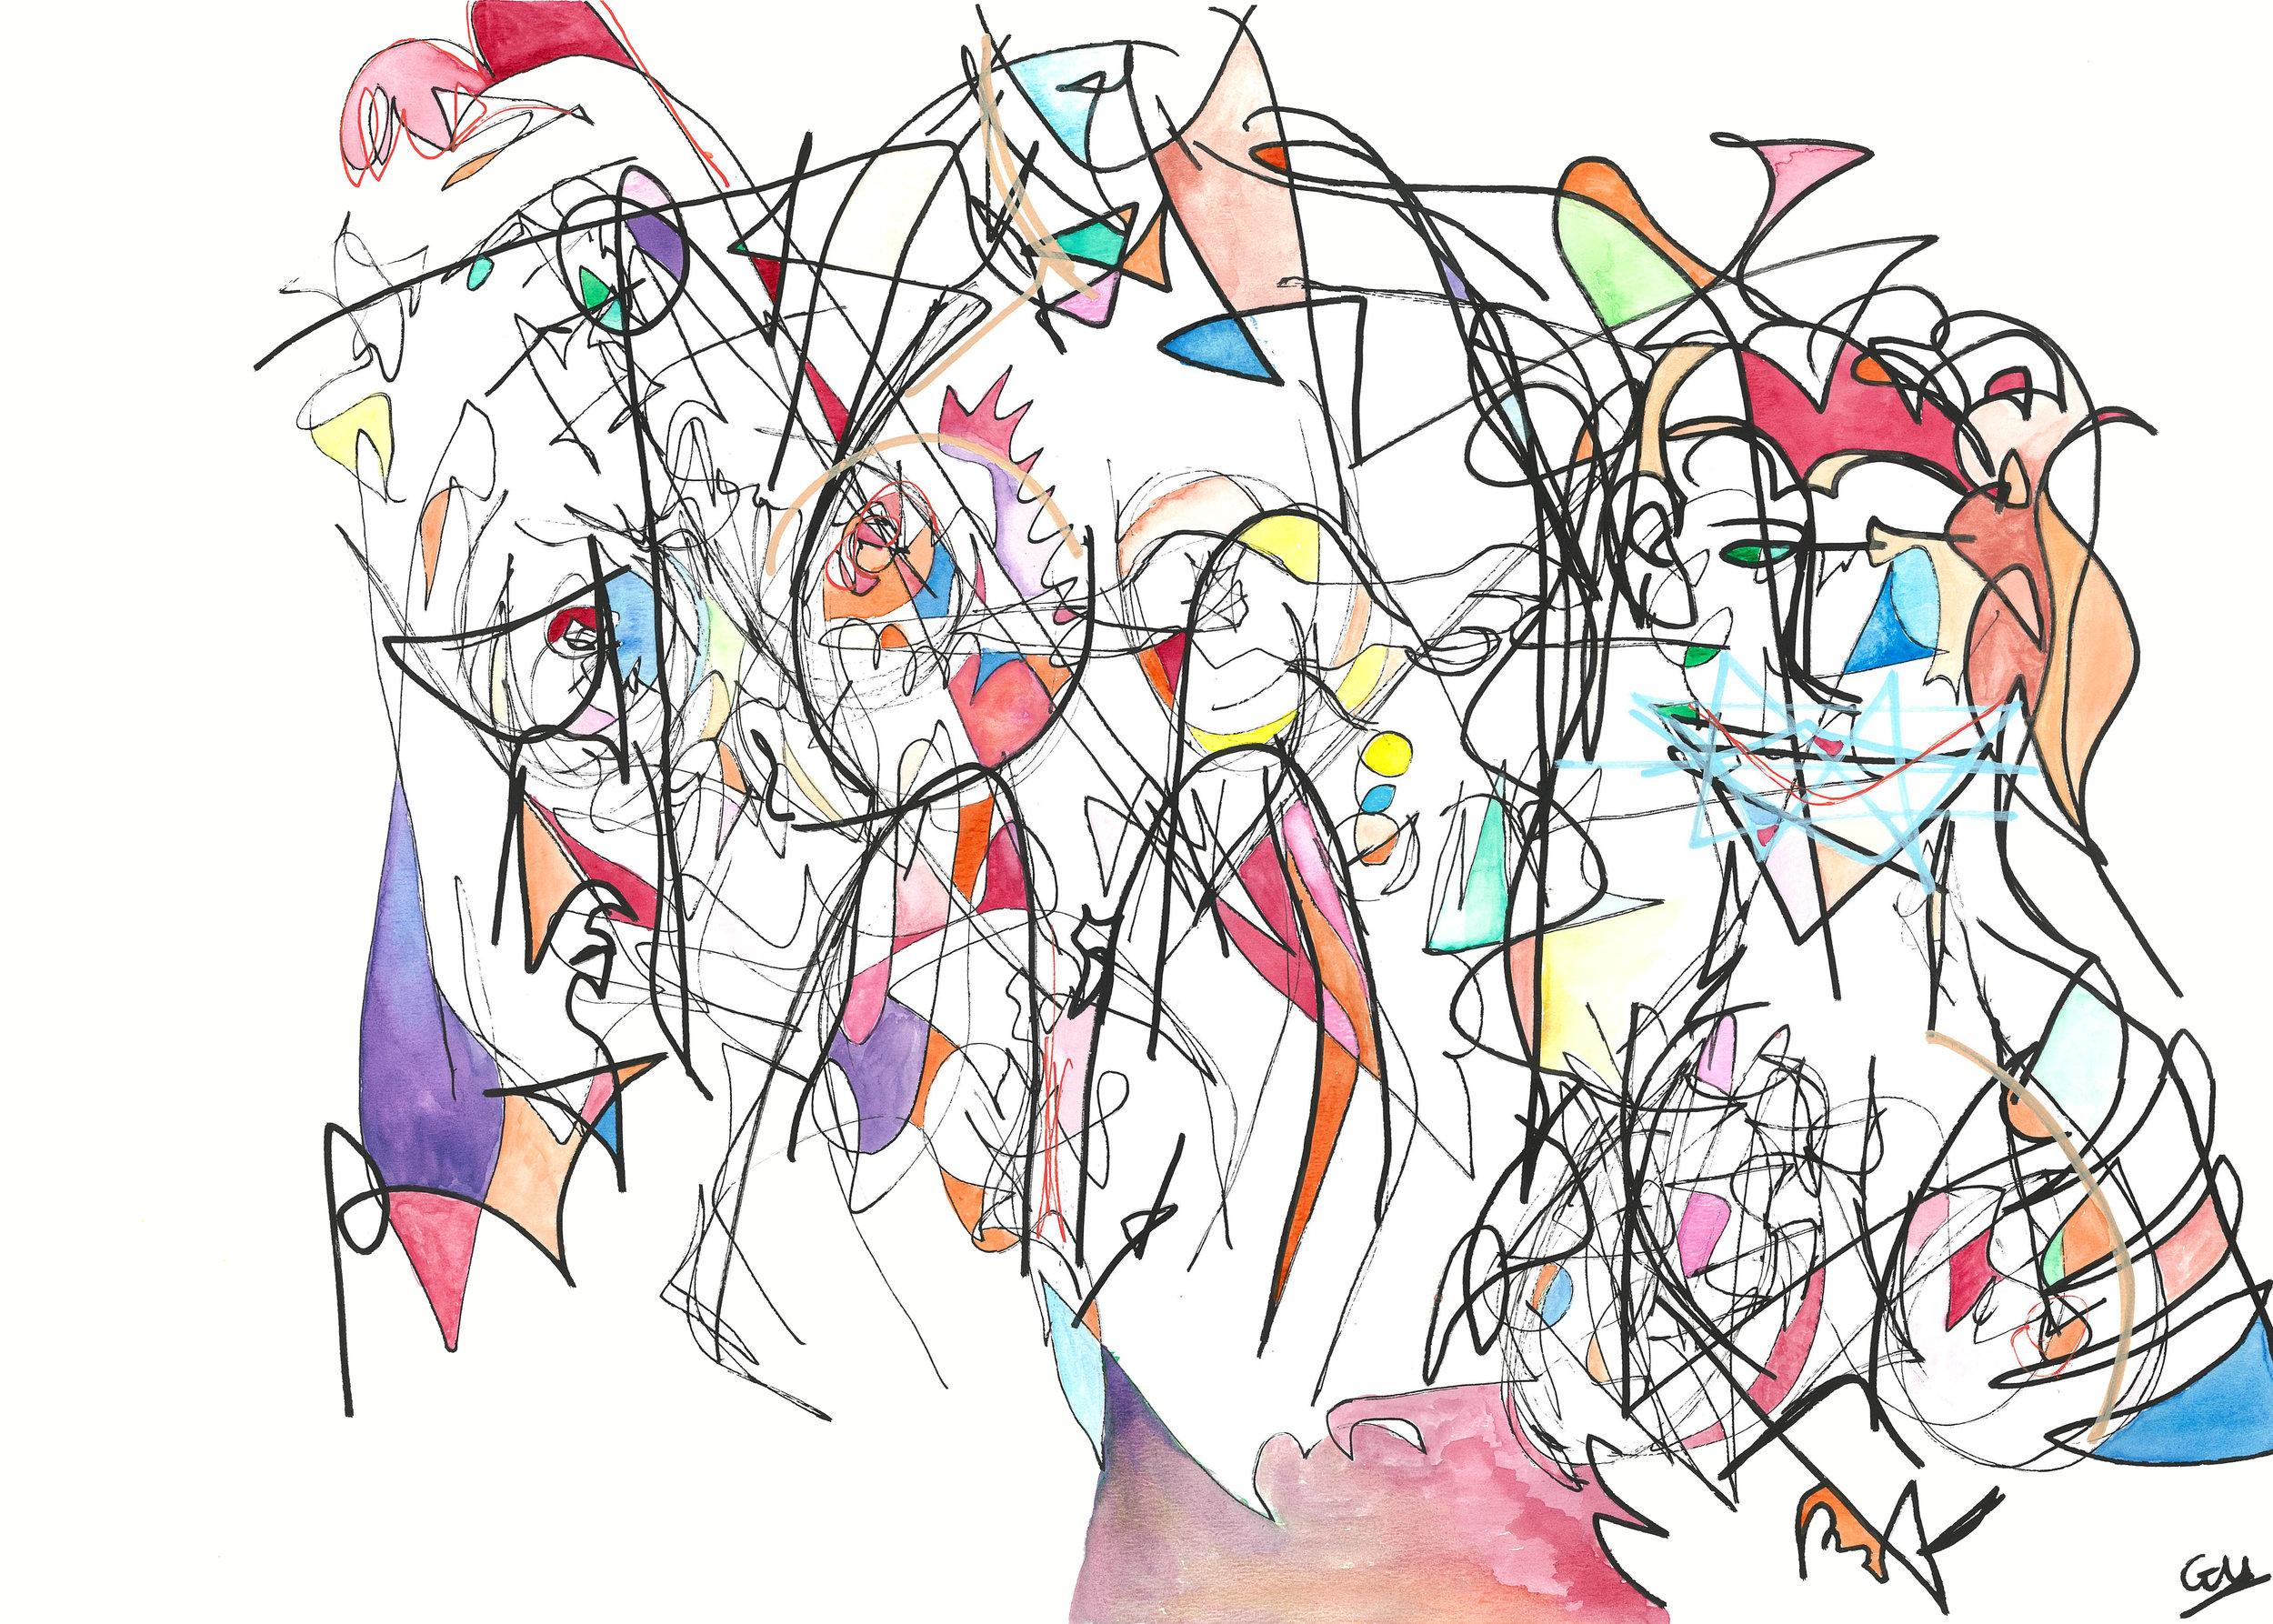 'M' (Watercolour, 20inx30in, 2018)